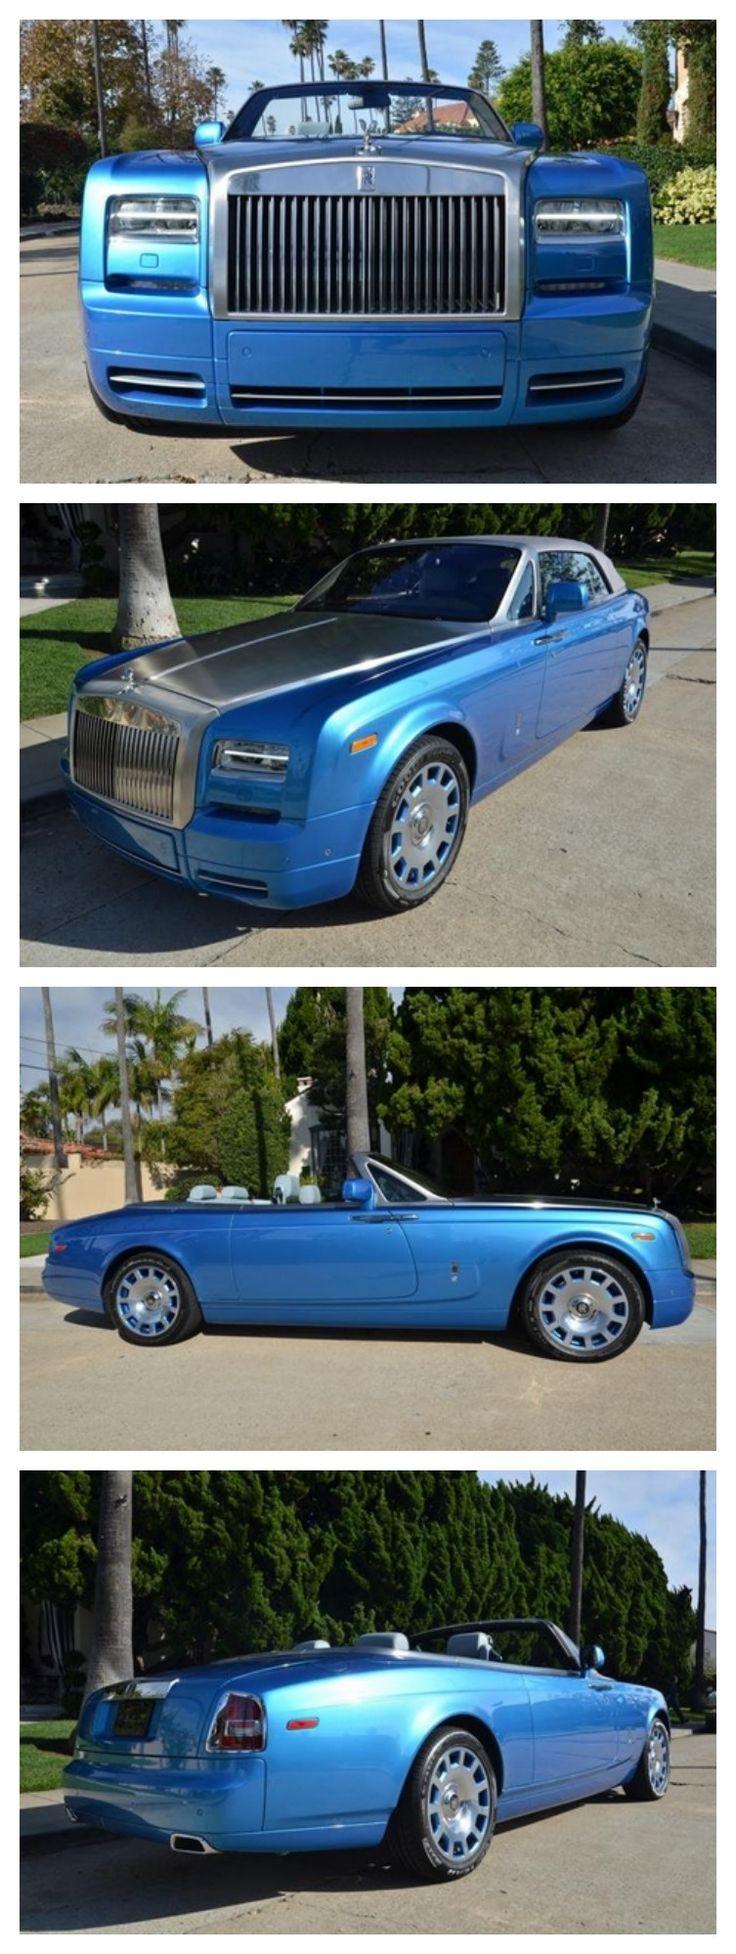 Luxurious Rolls Royce Phantom Waterspeed Edition #DreamCars